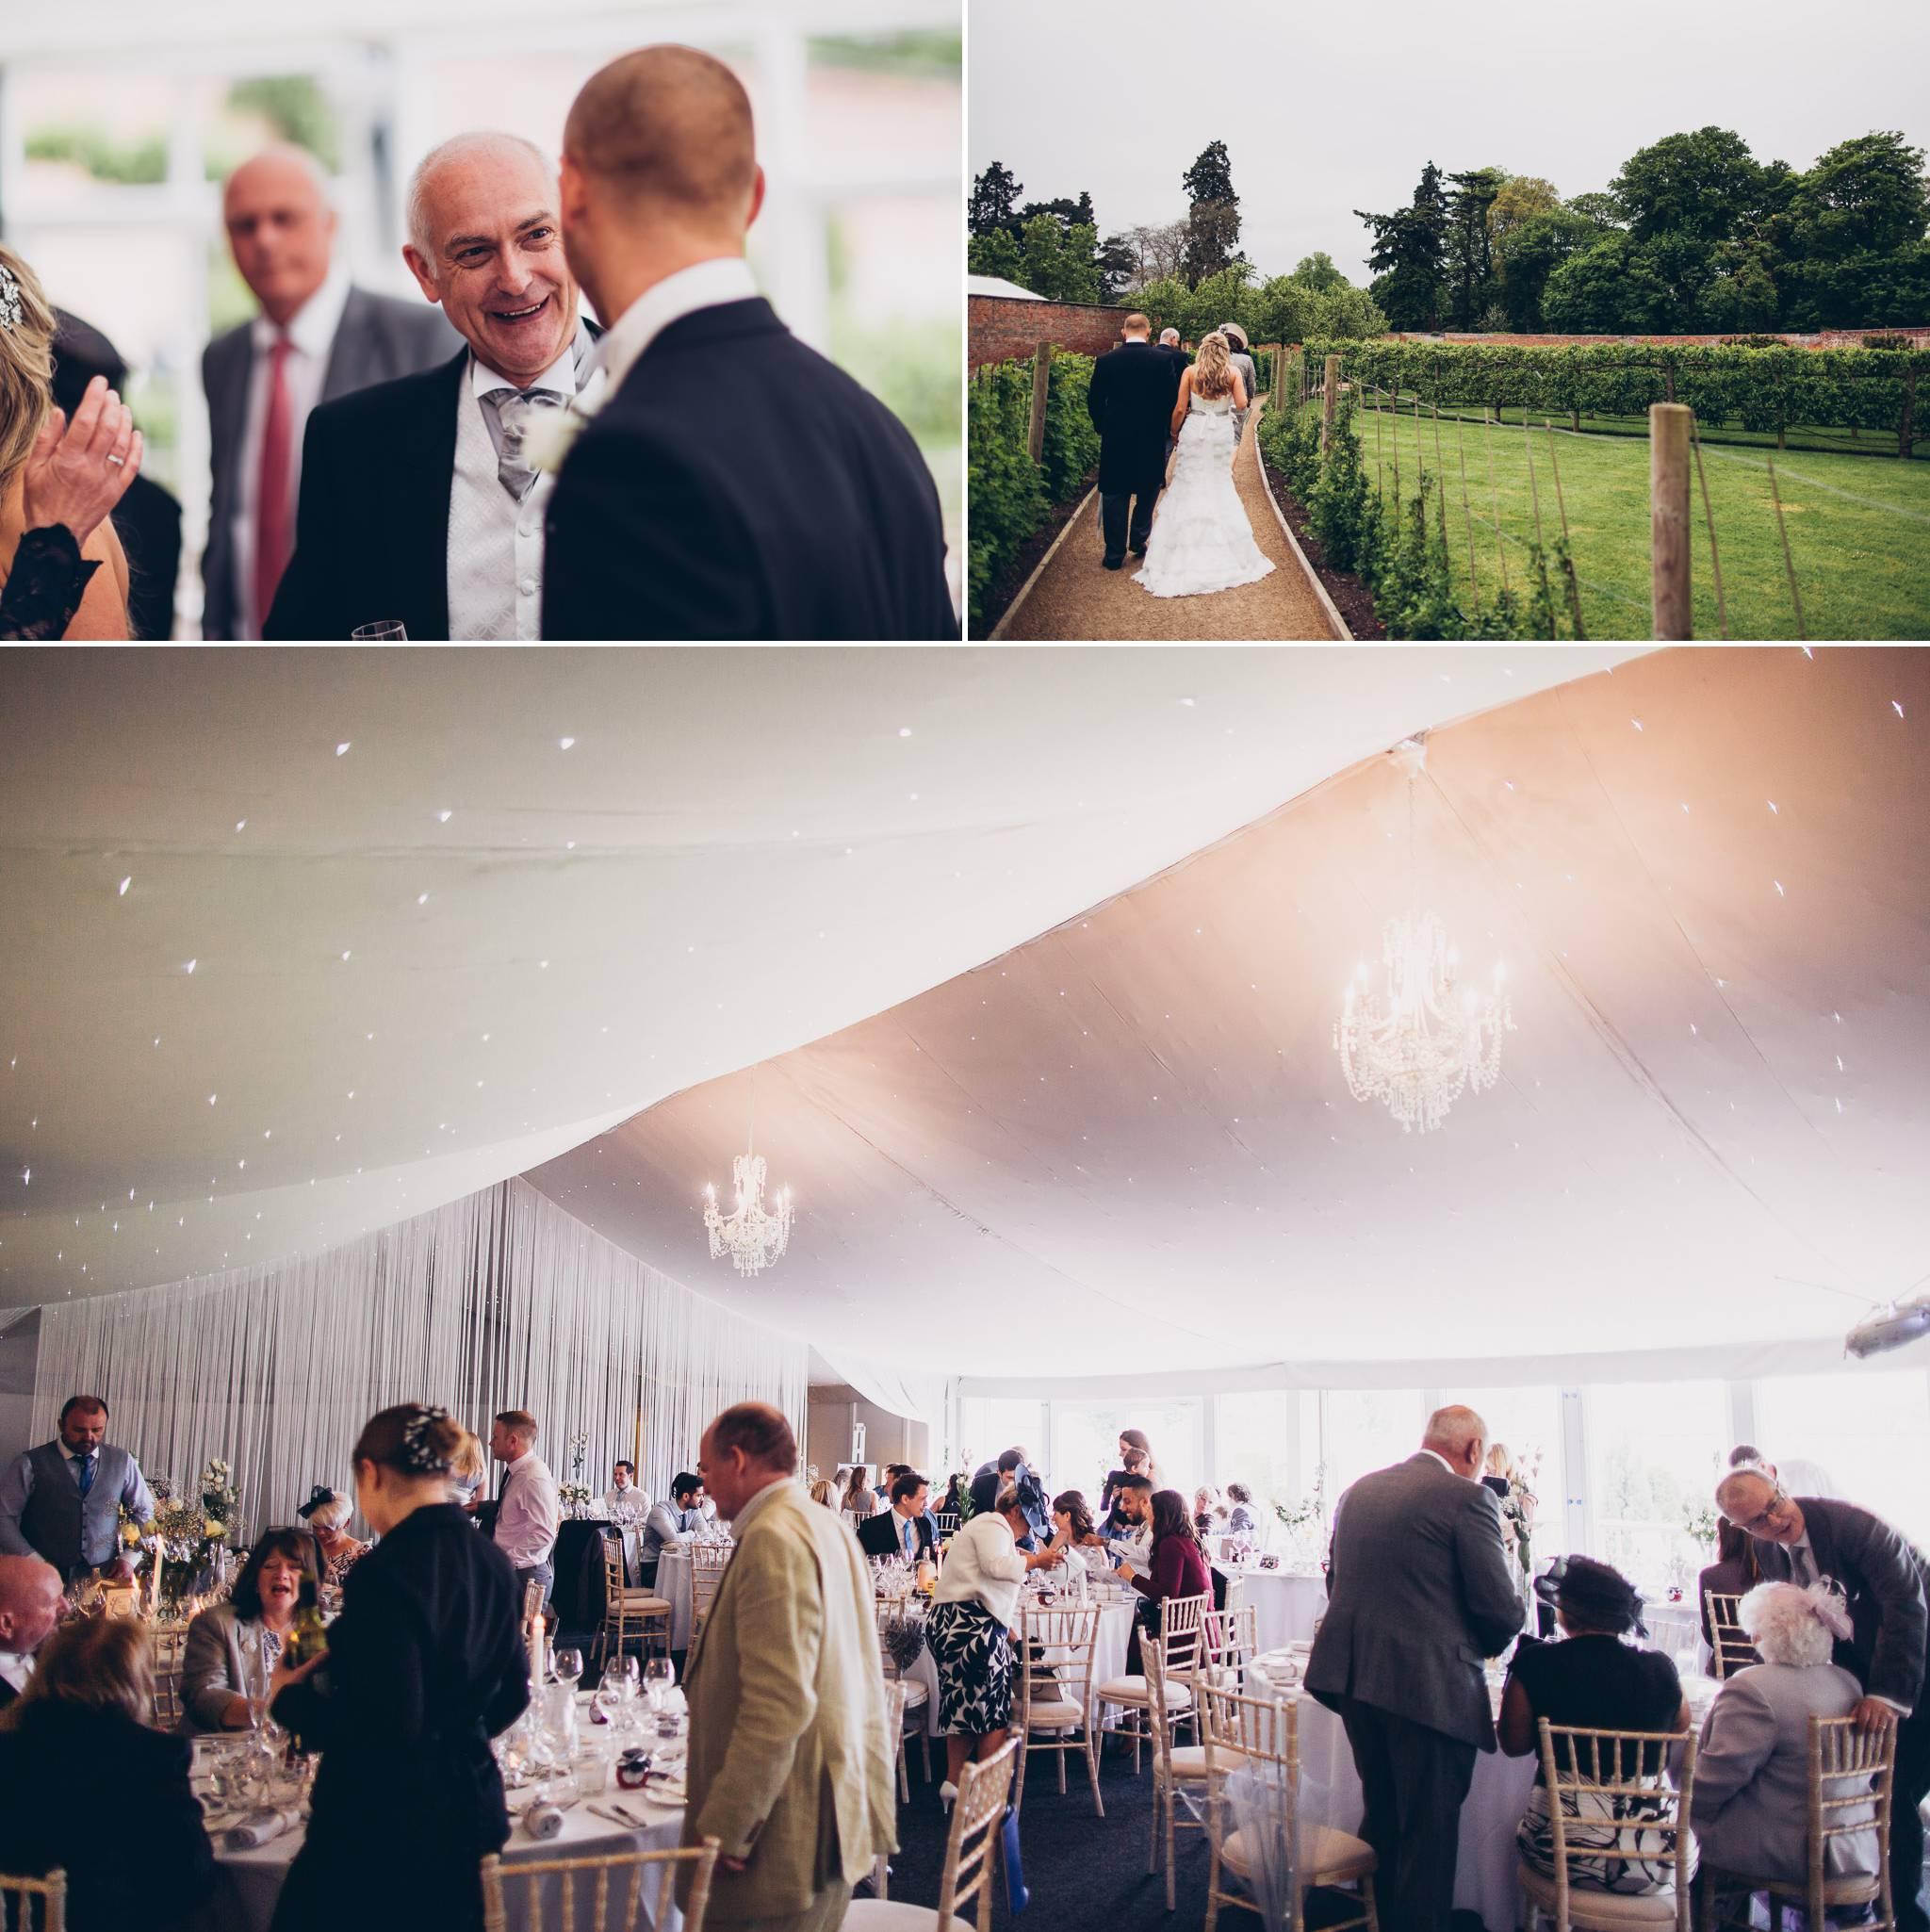 shropshire-wedding-photography 27.jpg